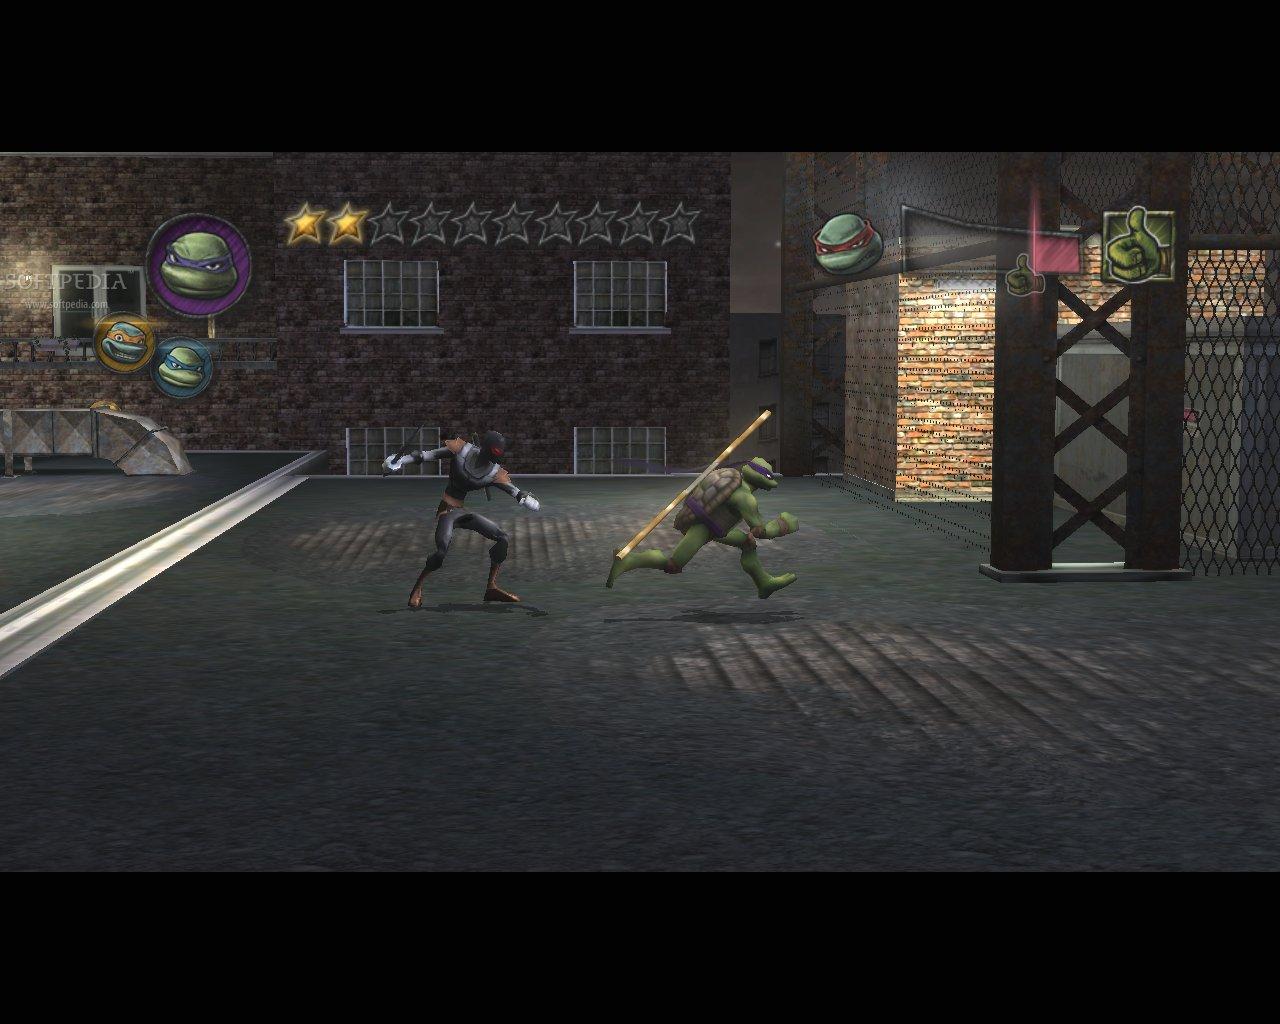 http://games.softpedia.com/screenshots/Teenage-Mutant-Ninja-Turtles-Demo_11.jpg